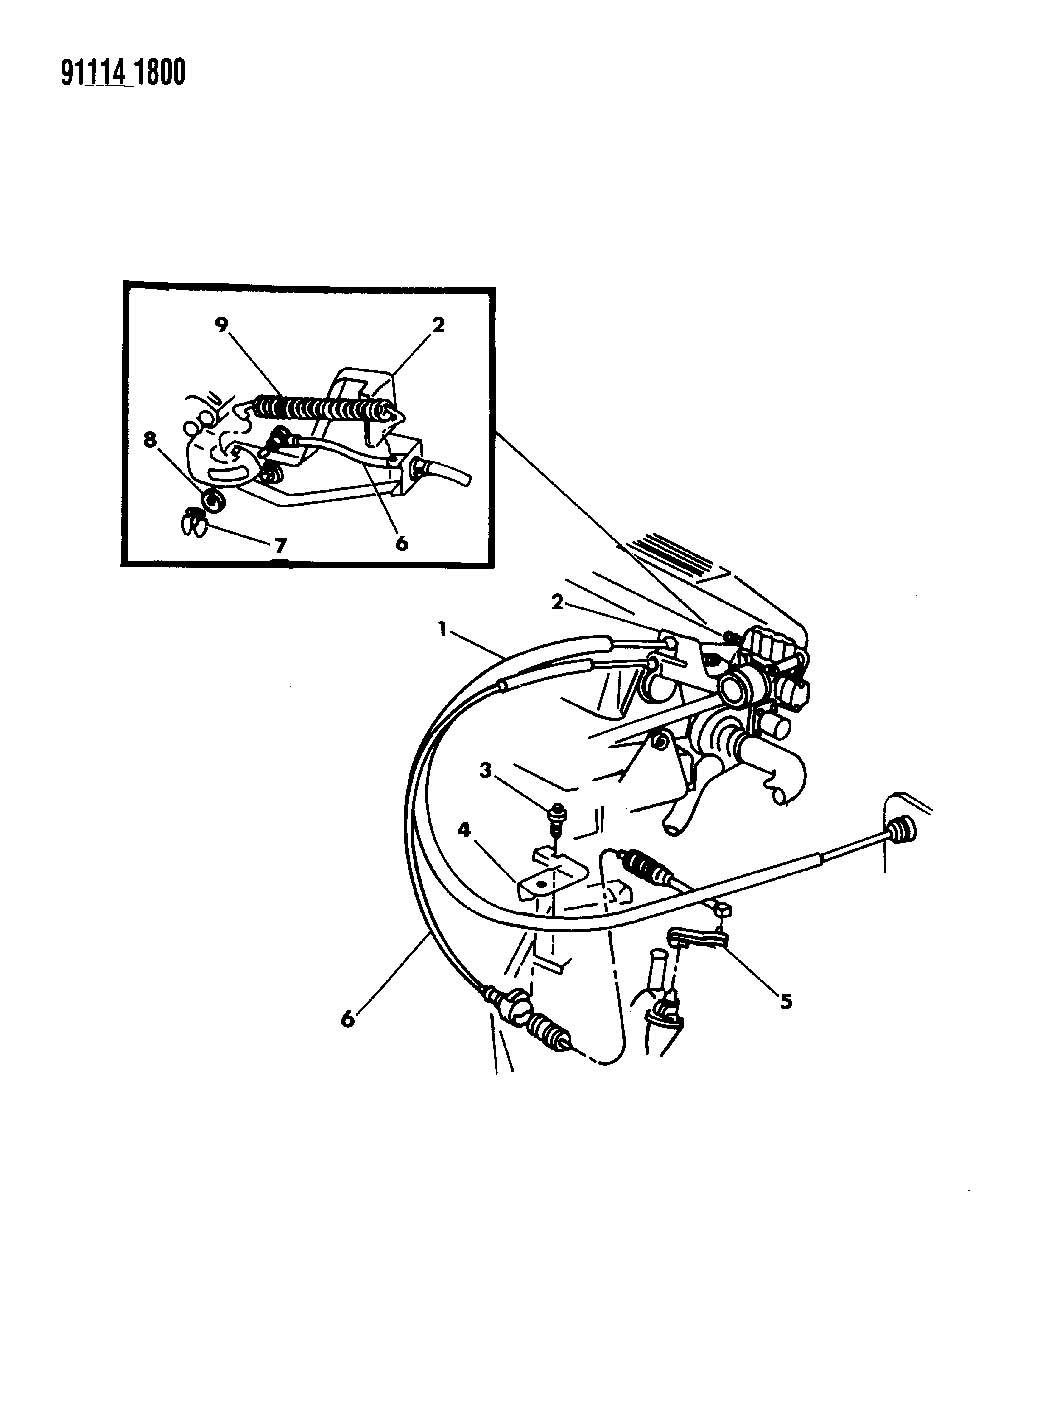 1991 dodge shadow throttle controls 2 5l engine